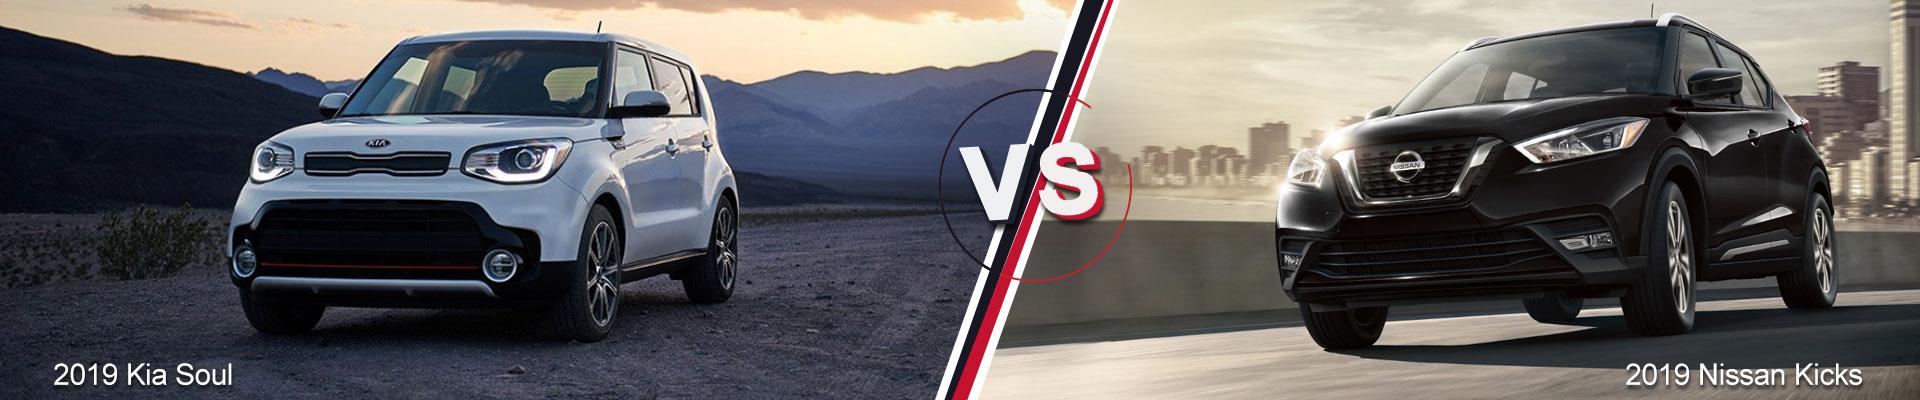 2019 Kia Soul VS. 2019 Nissan Kicks Kia of Duluth